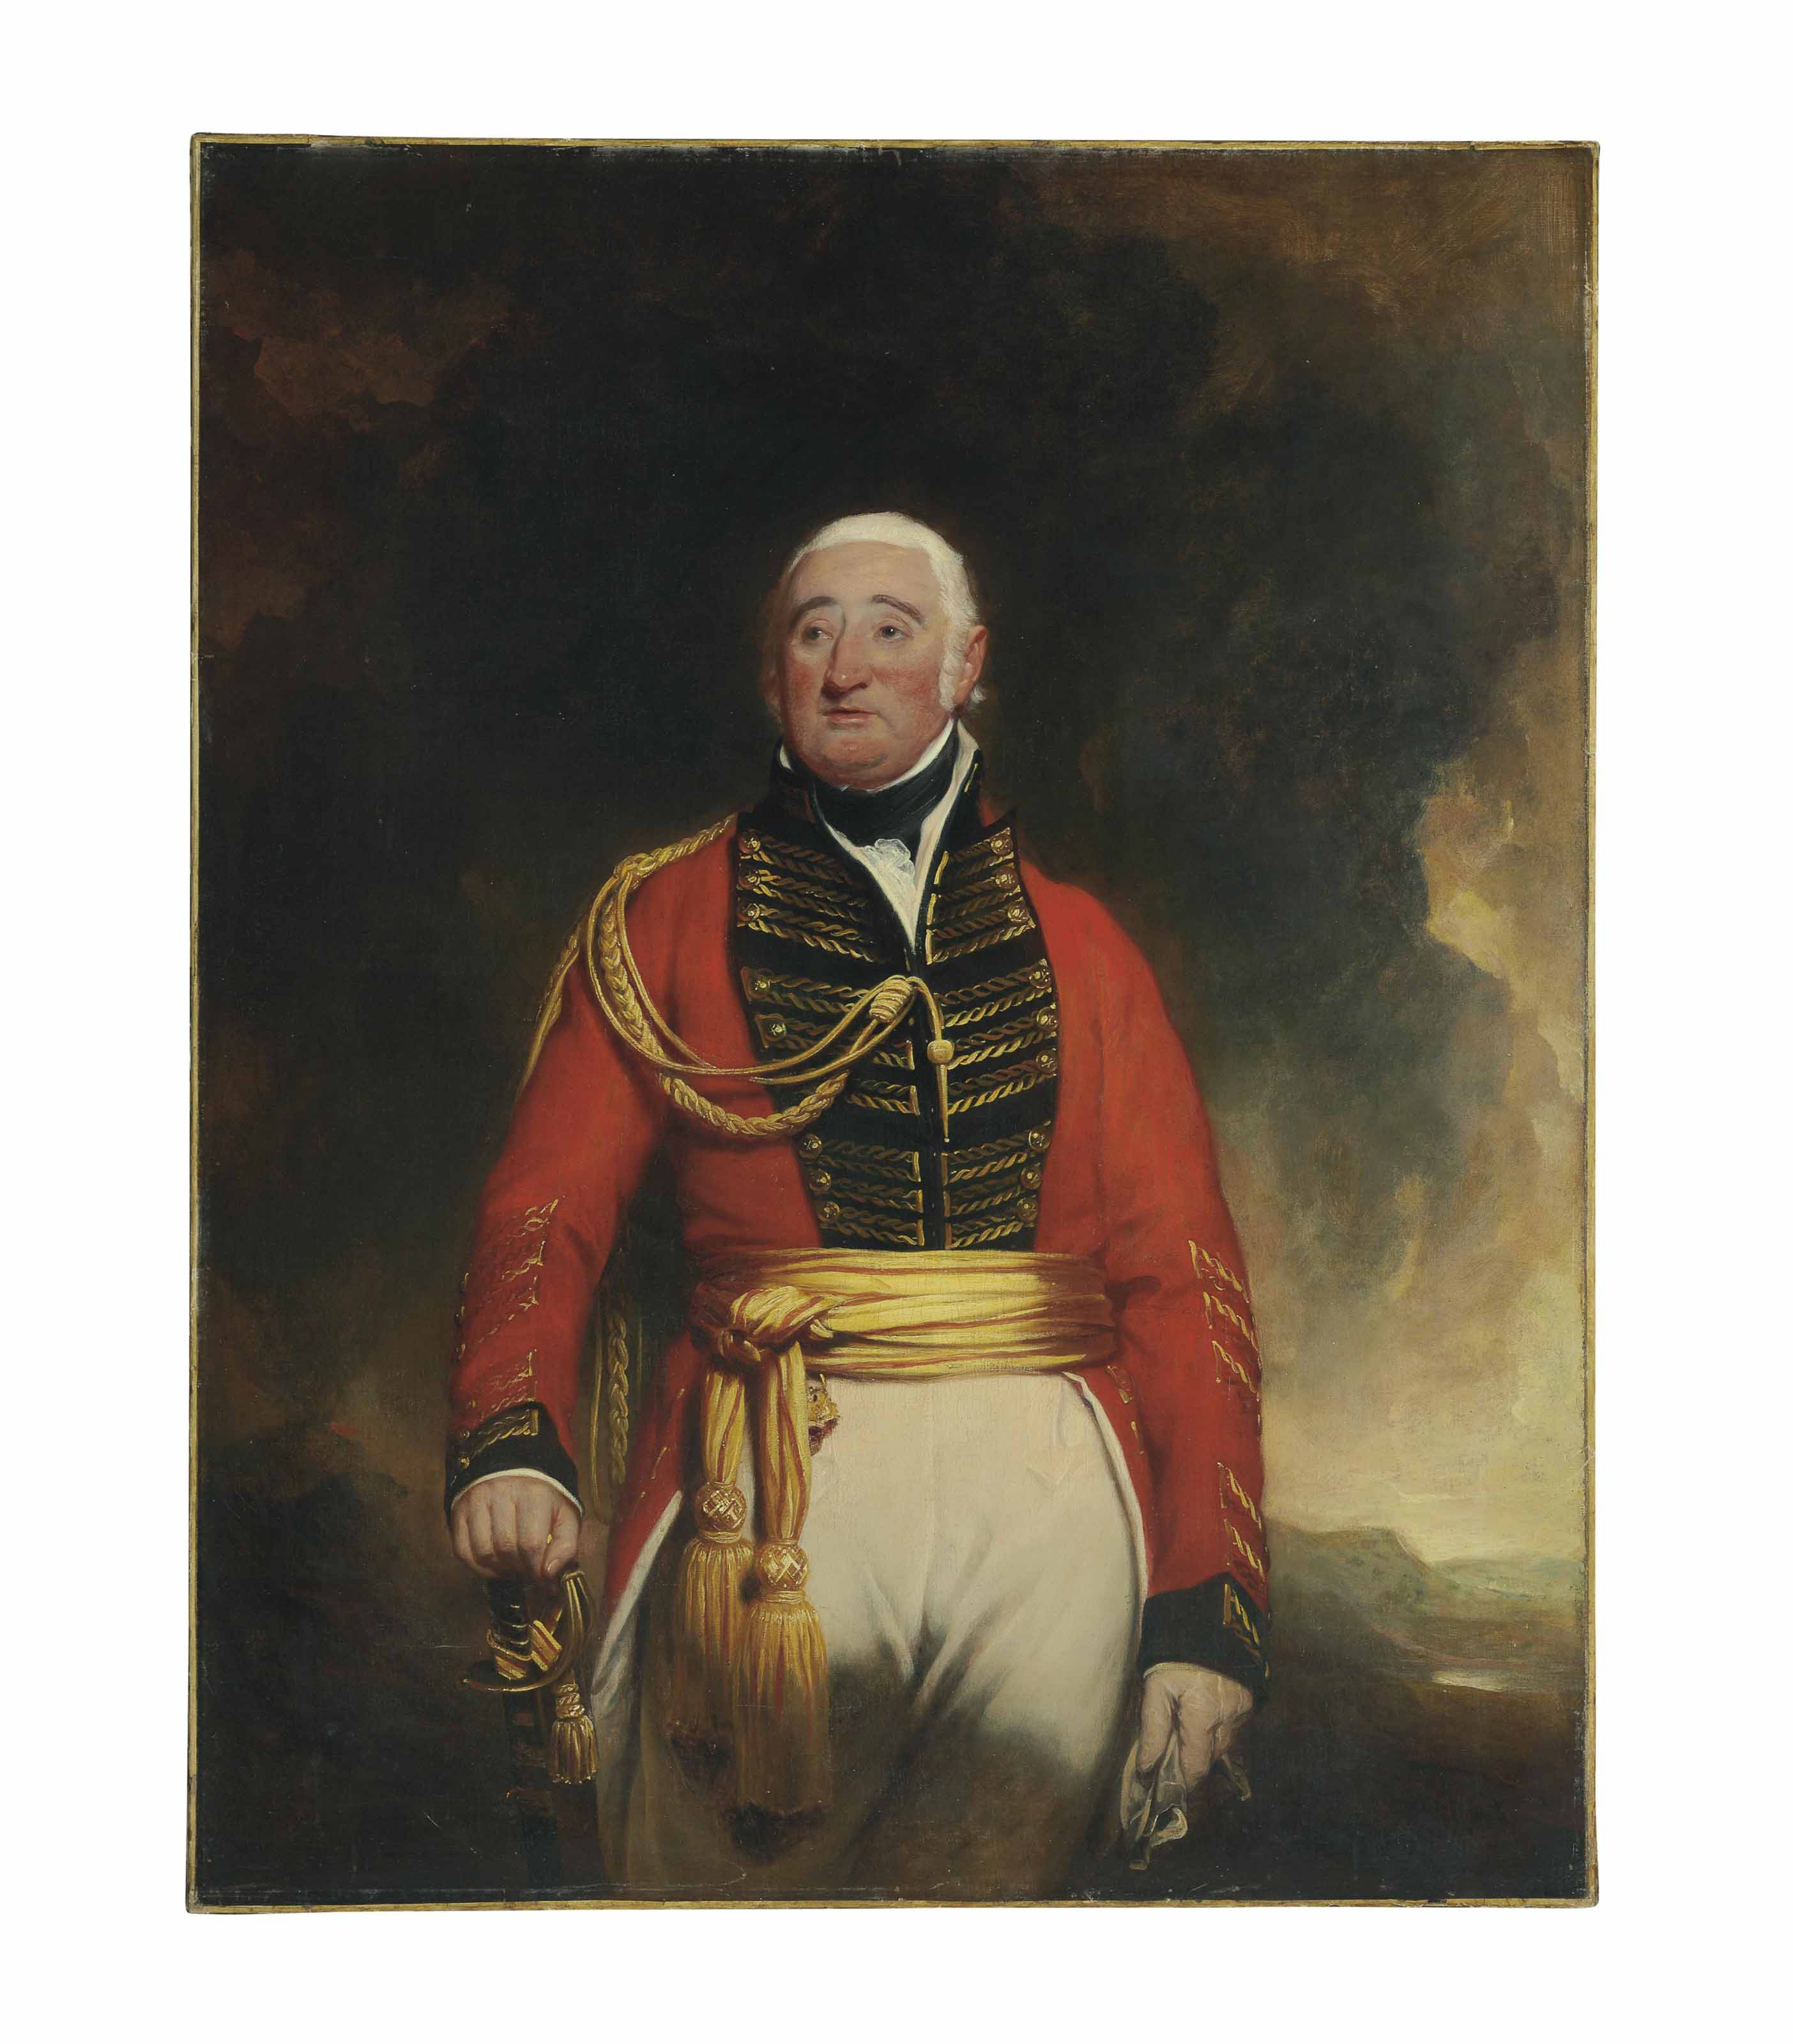 Portrait of Lieutenant General Daniel Burr (1749-1828), standing three-quarter length, in a red uniform